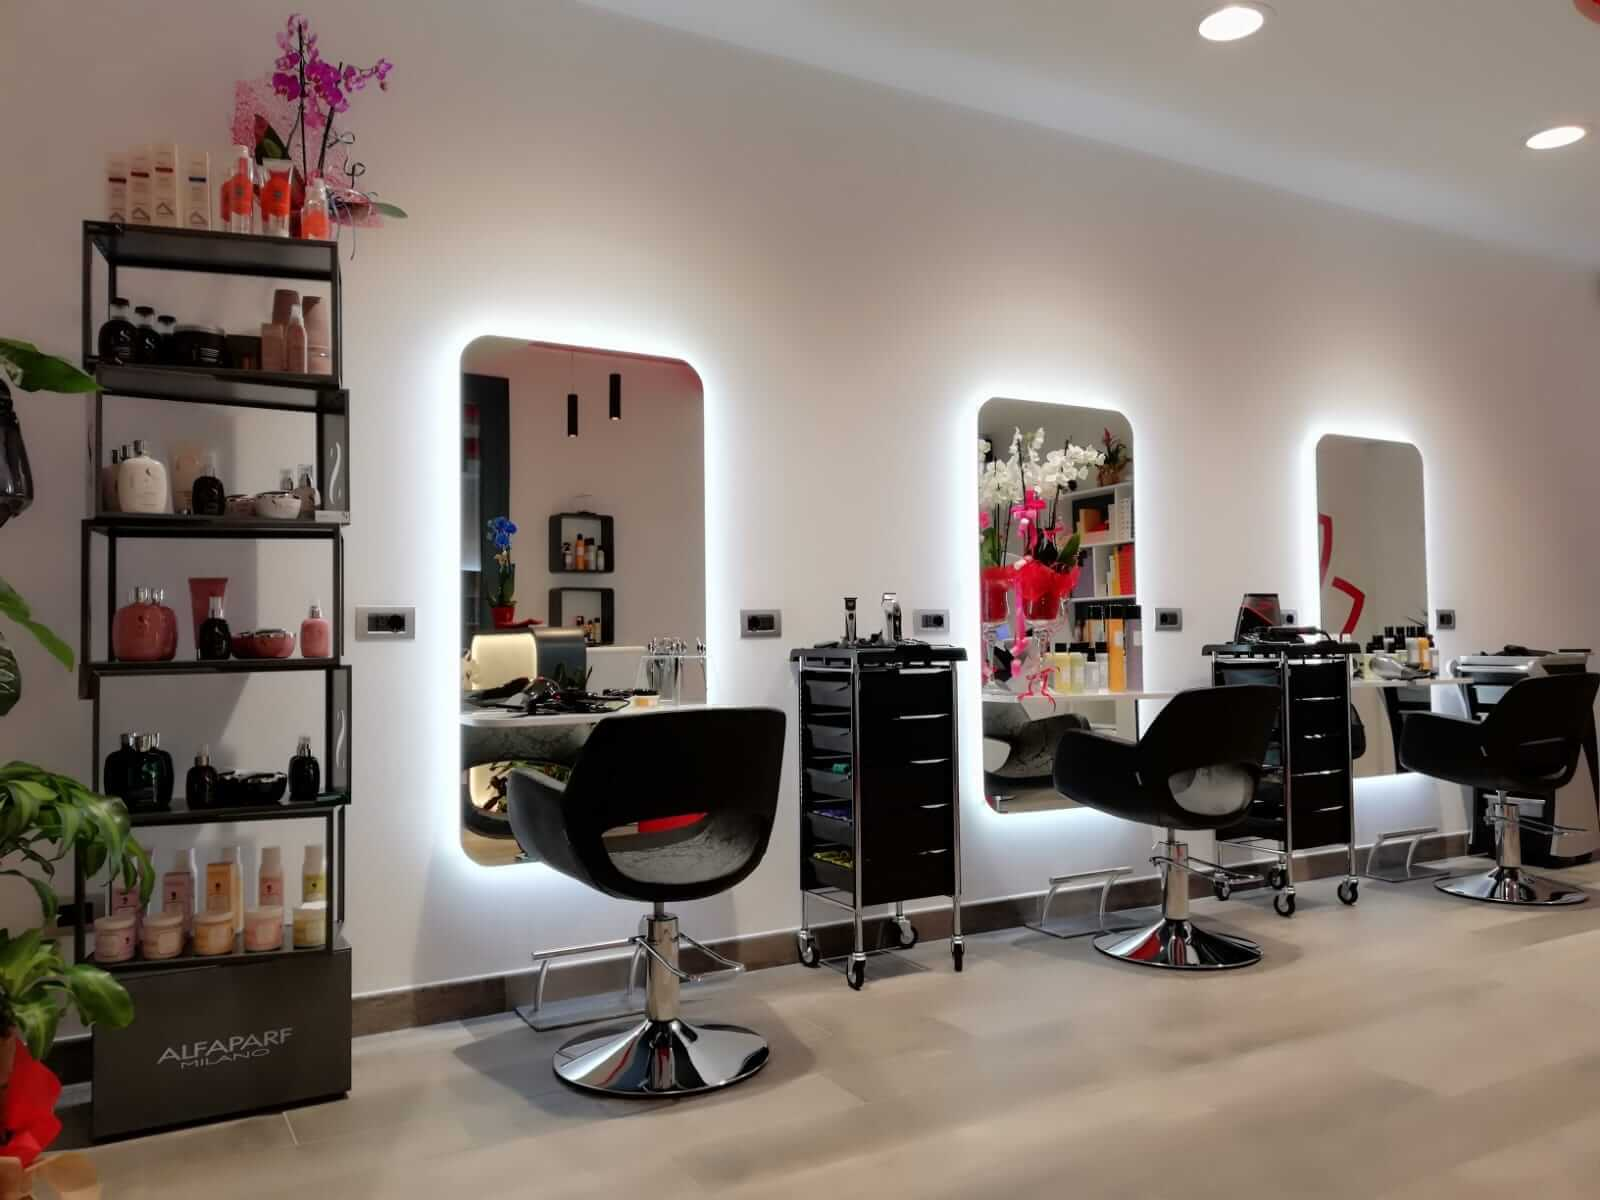 poltrona per parrucchieri in offerta